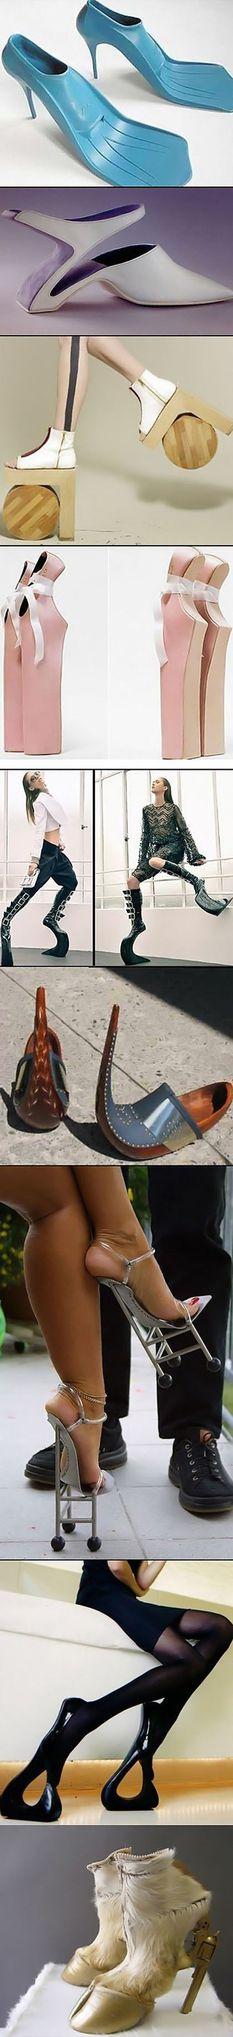 Wow sepatu high heels yg unik :)